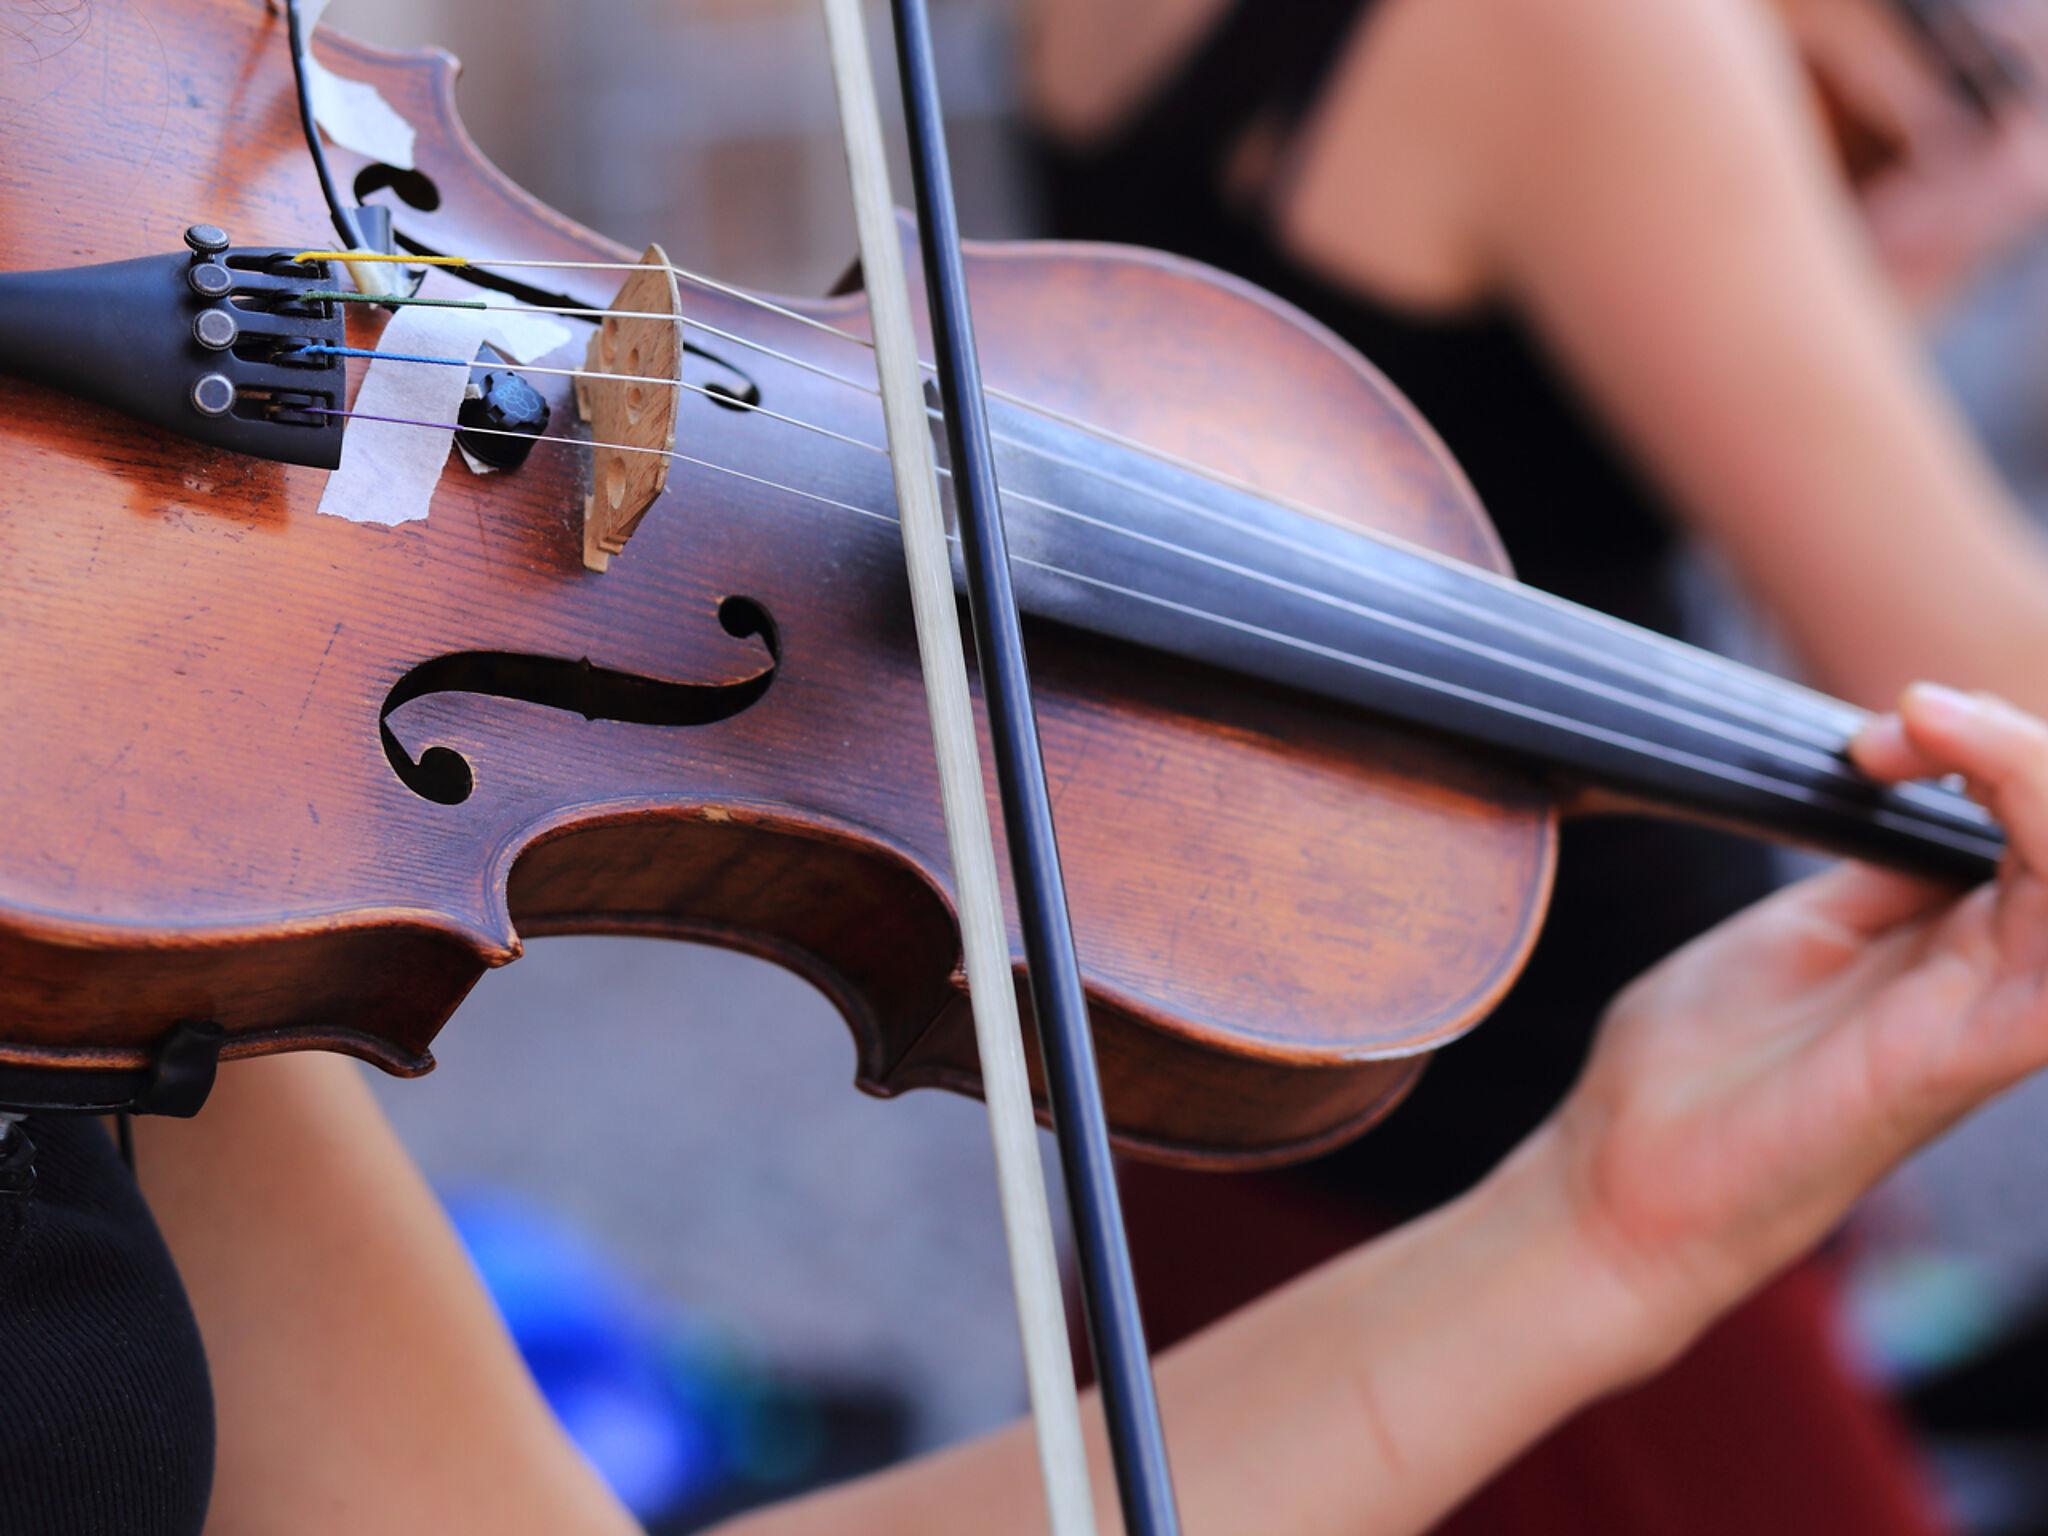 ヴァイオリンを演奏している人のヴァイオリンのアップ画像